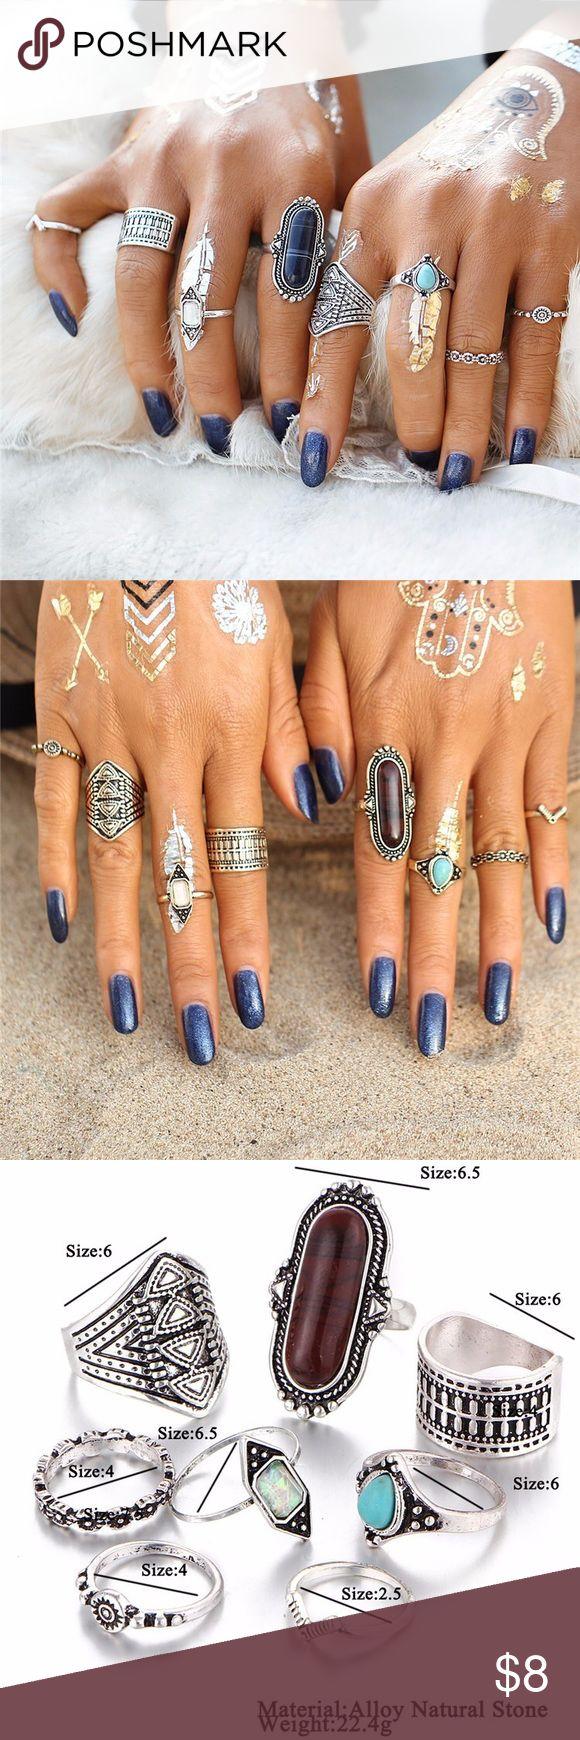 103 best Turkish Jewelry images on Pinterest | Turkish jewelry ...